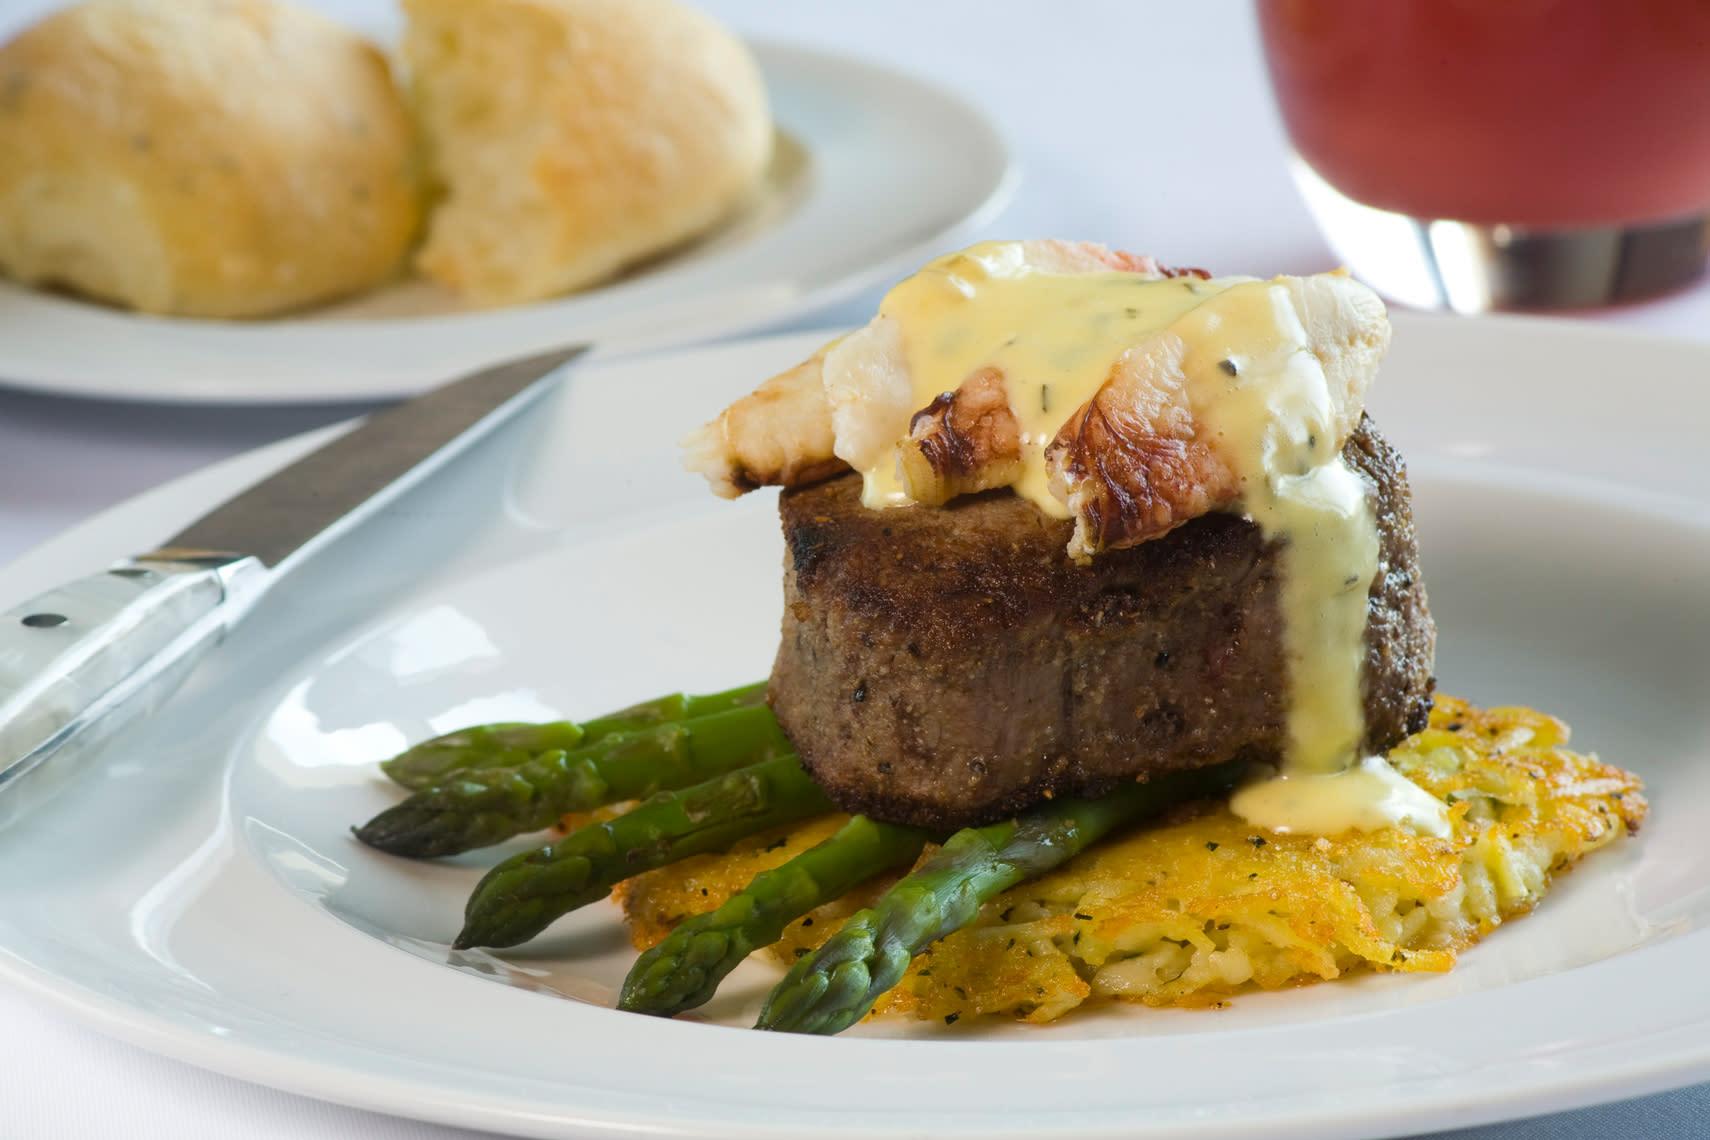 Delicious steak drizzled in signature sauce